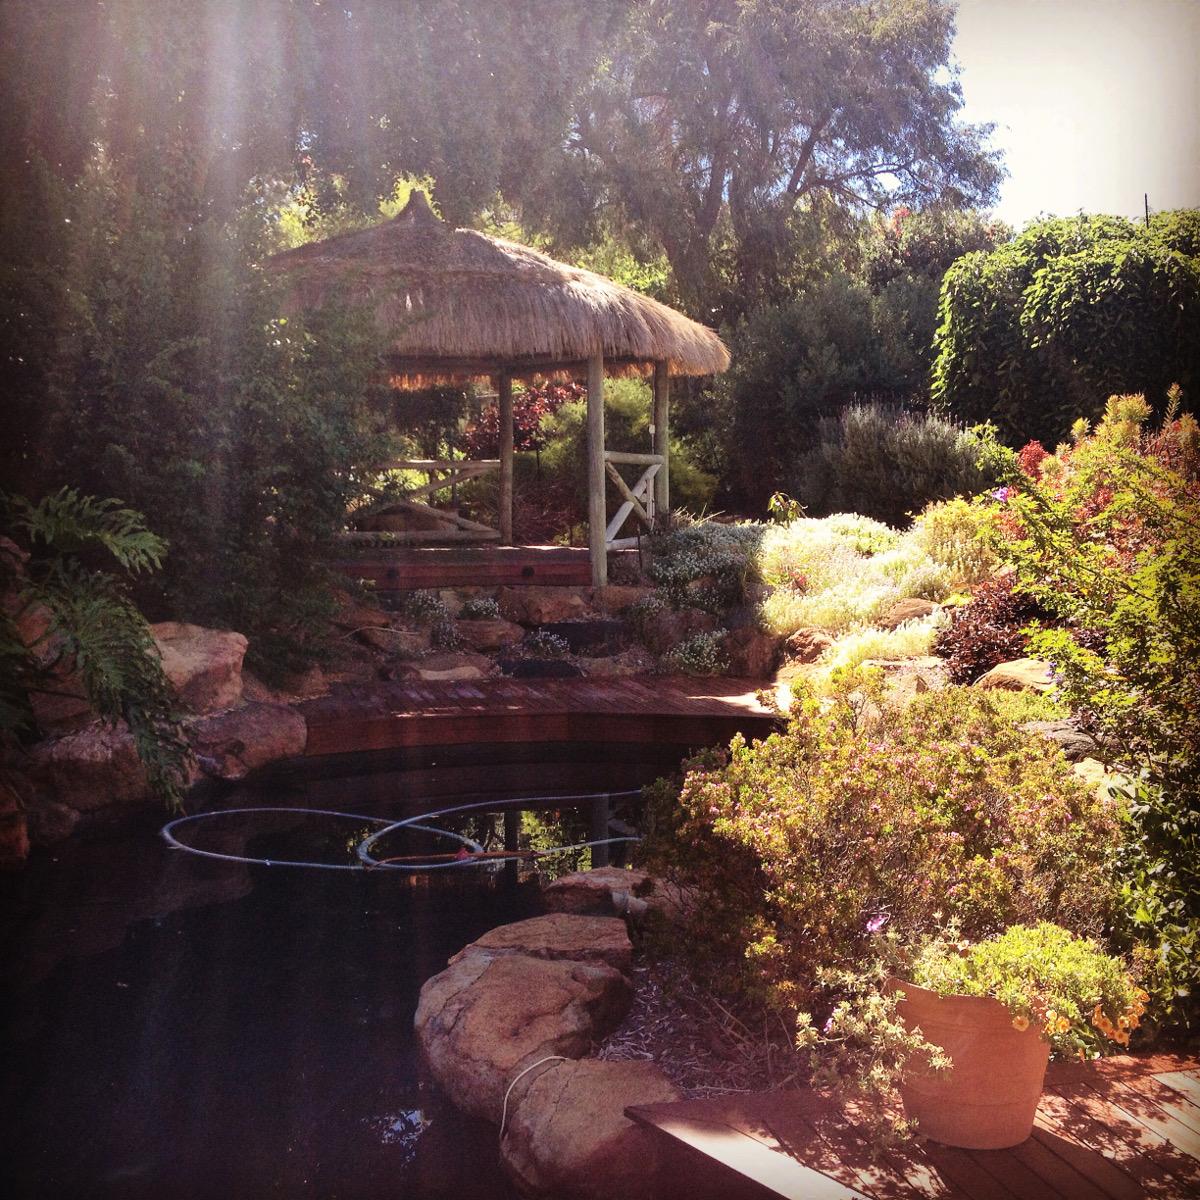 Garden Perth Australia Double-Barrelled Travel